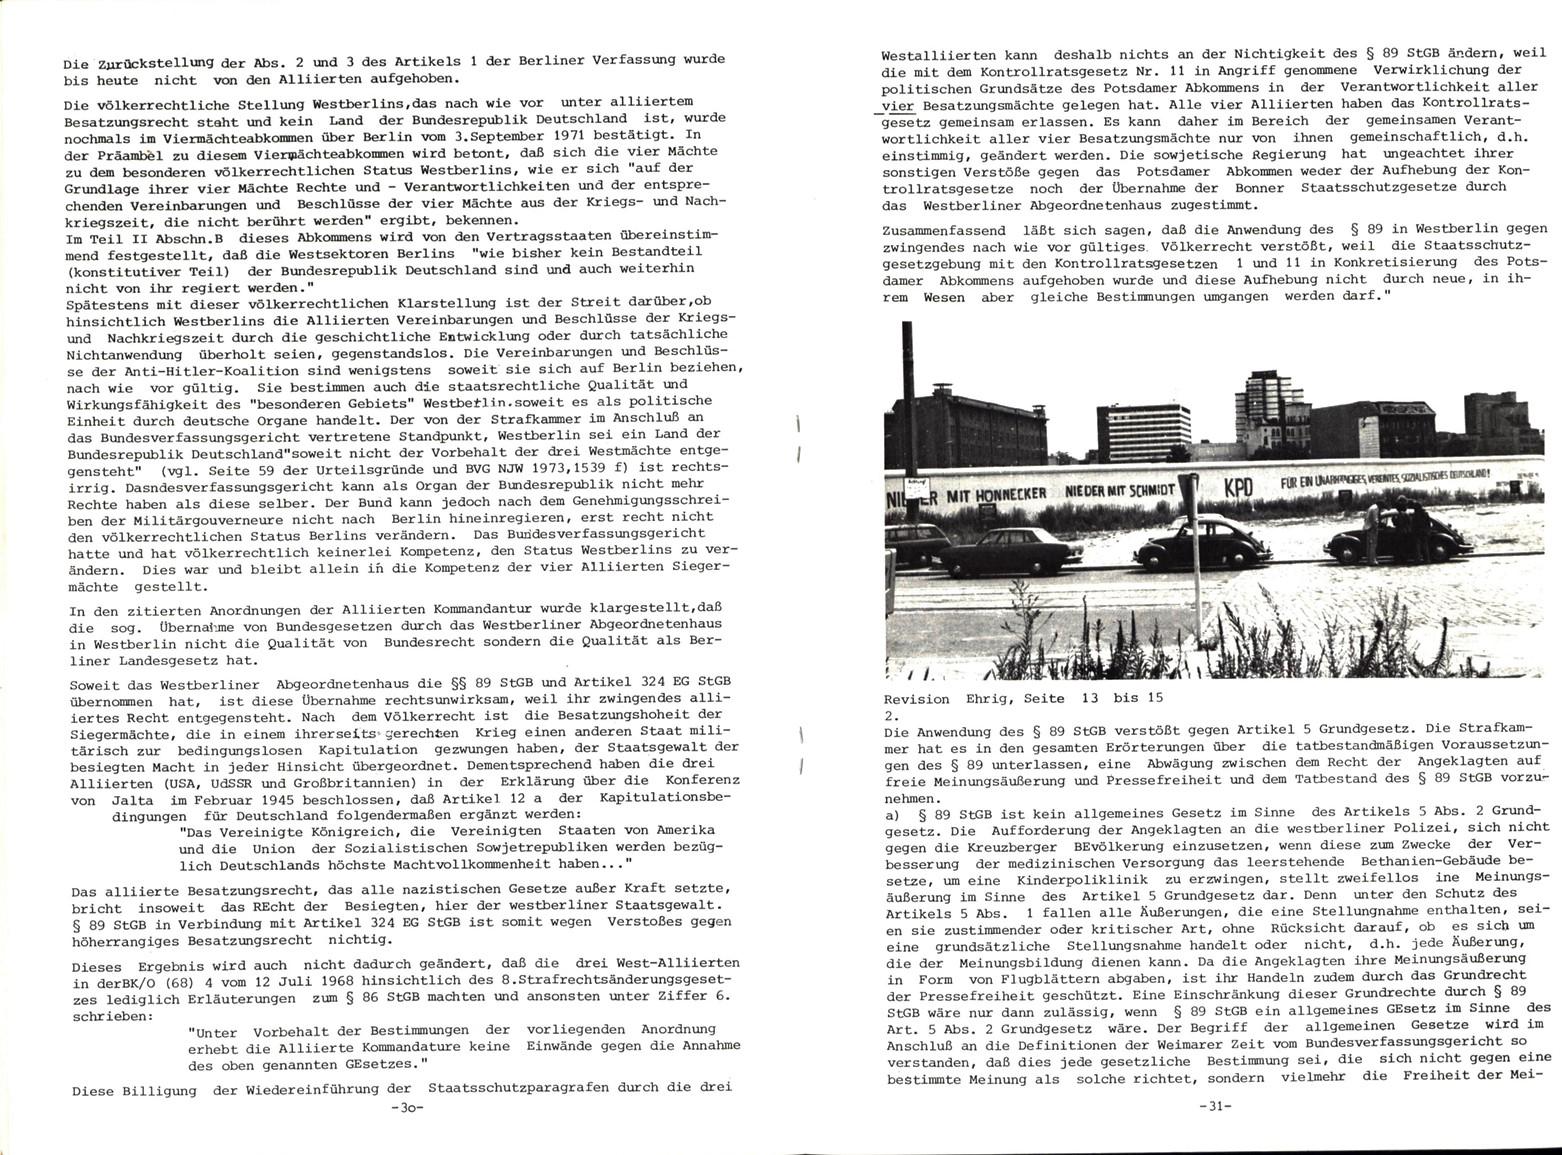 KPDAO_1976_Staatsschutzparagrafen_16